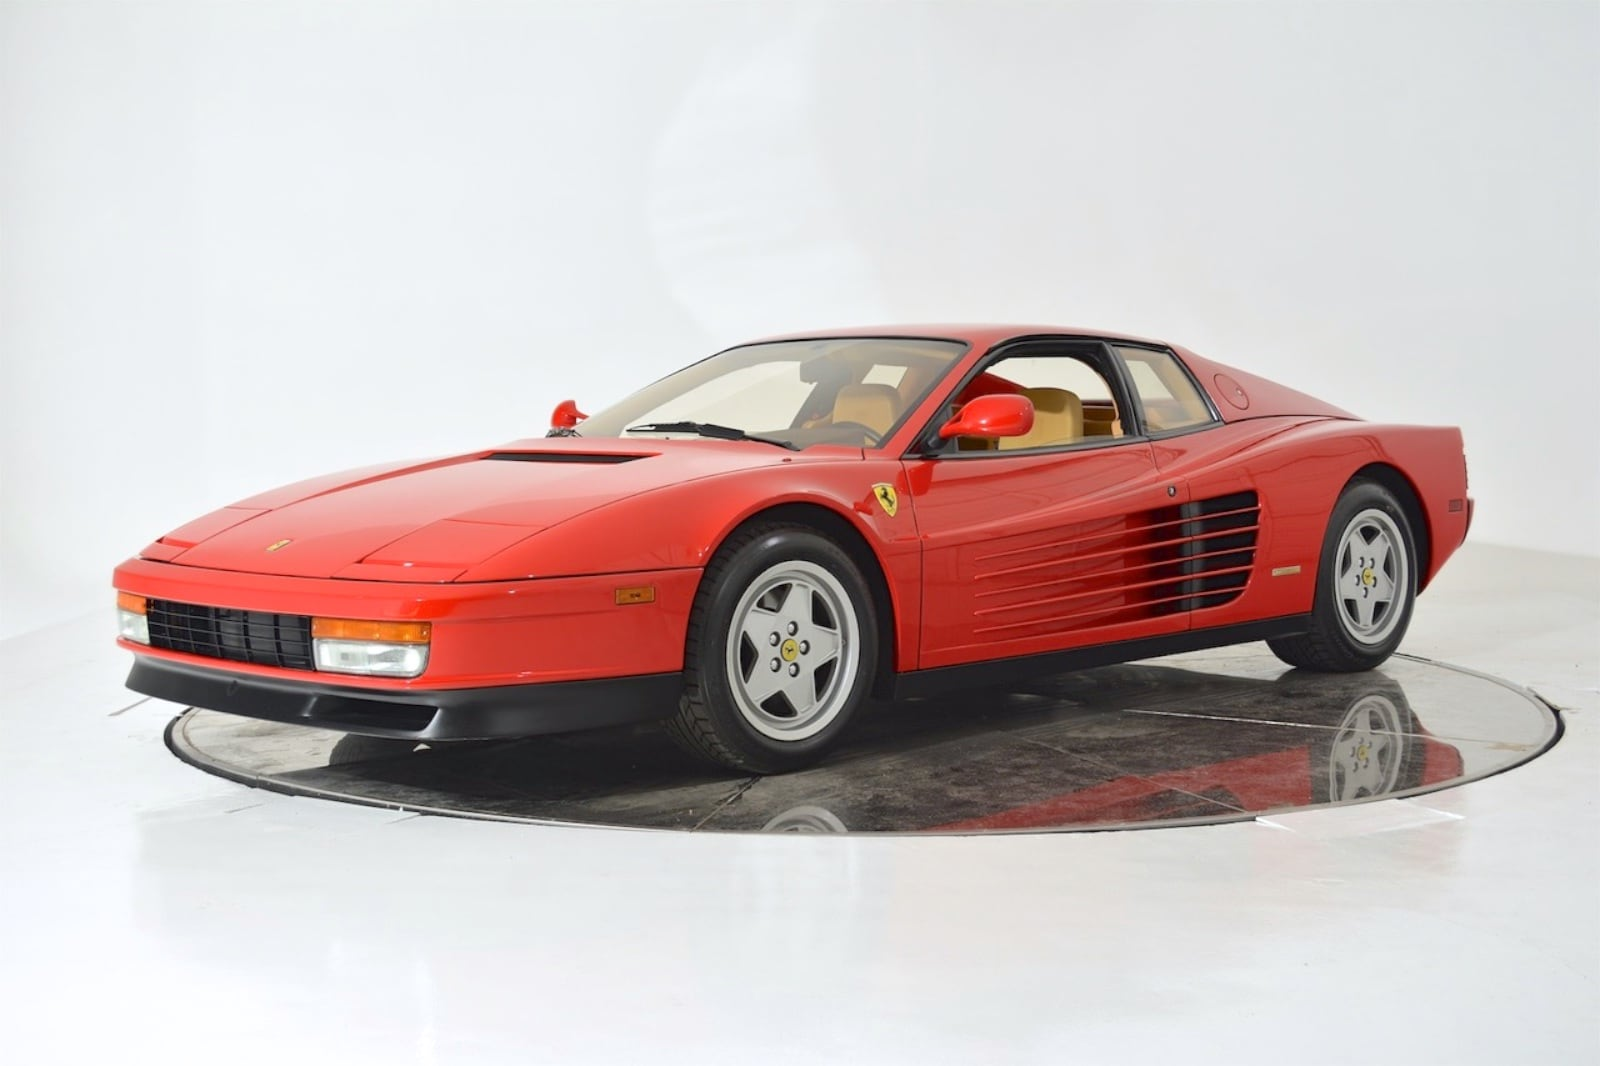 1989 FERRARI TESTAROSSA Coupe